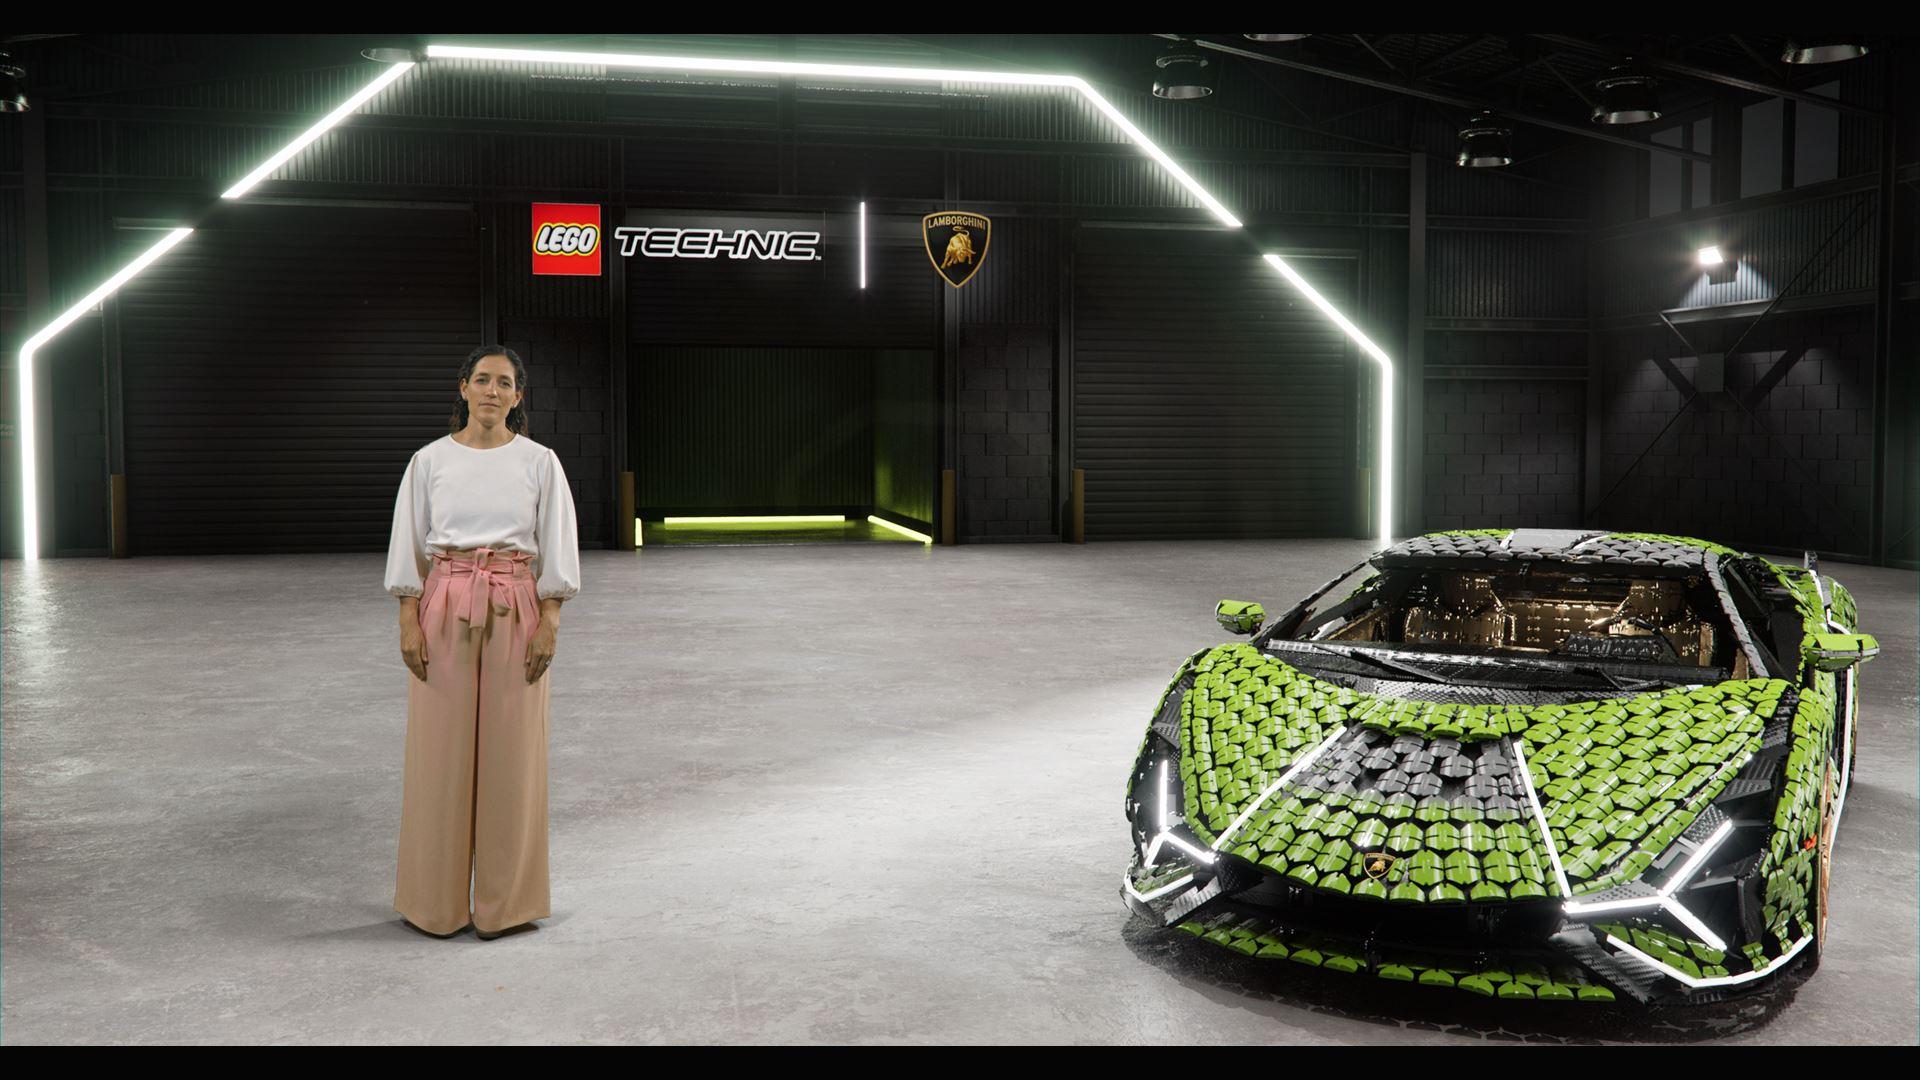 Automobili Lamborghini builds dream cars, also with LEGO® Technic™ - Life-size Lamborghini Sián FKP 37 created from over 400,000 LEGO® elements - Image 2